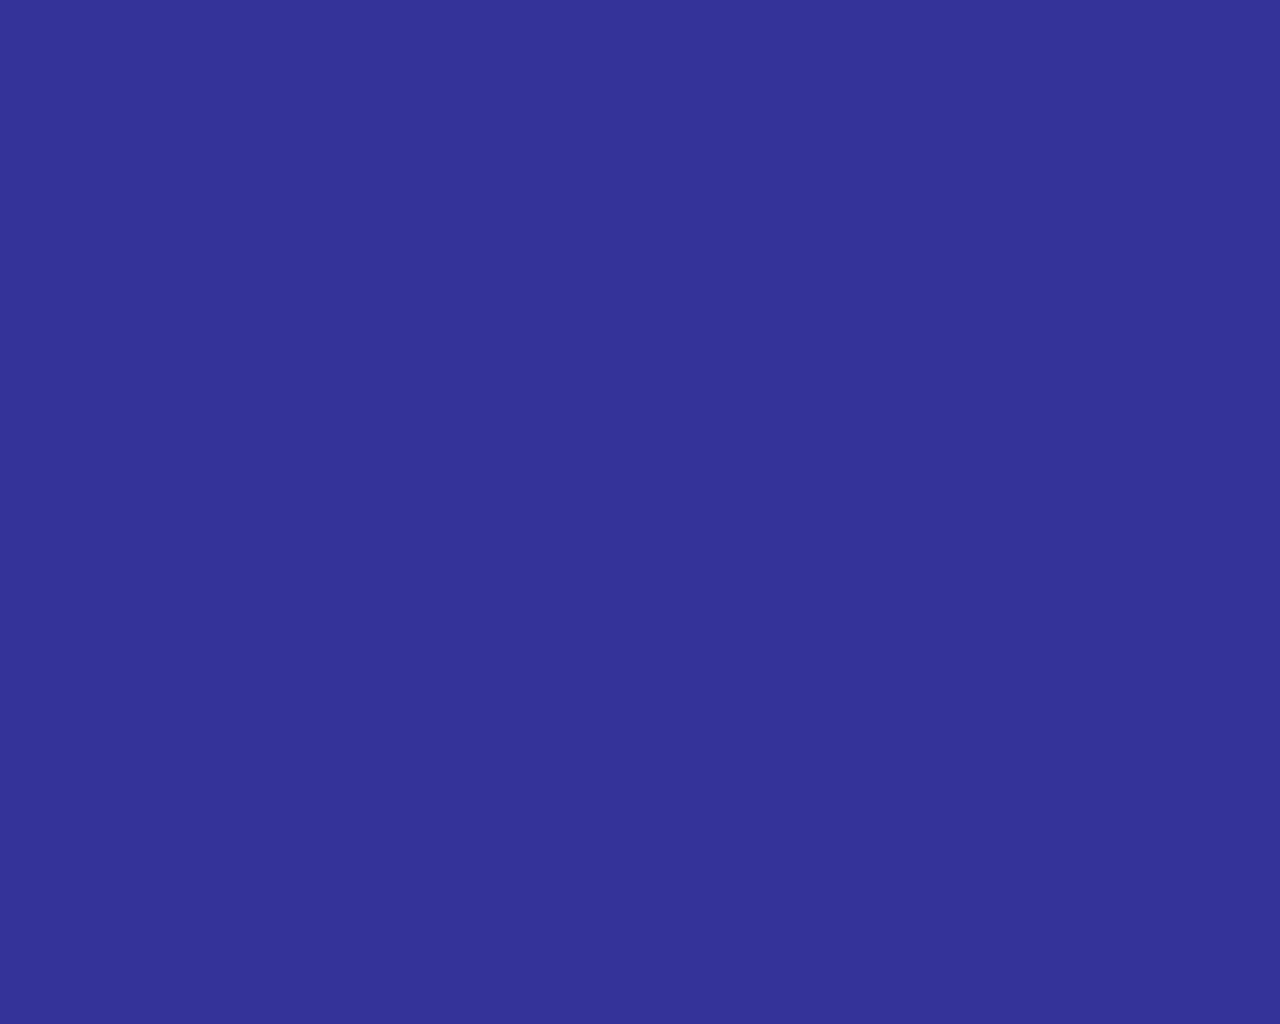 1280x1024 Blue Pigment Solid Color Background